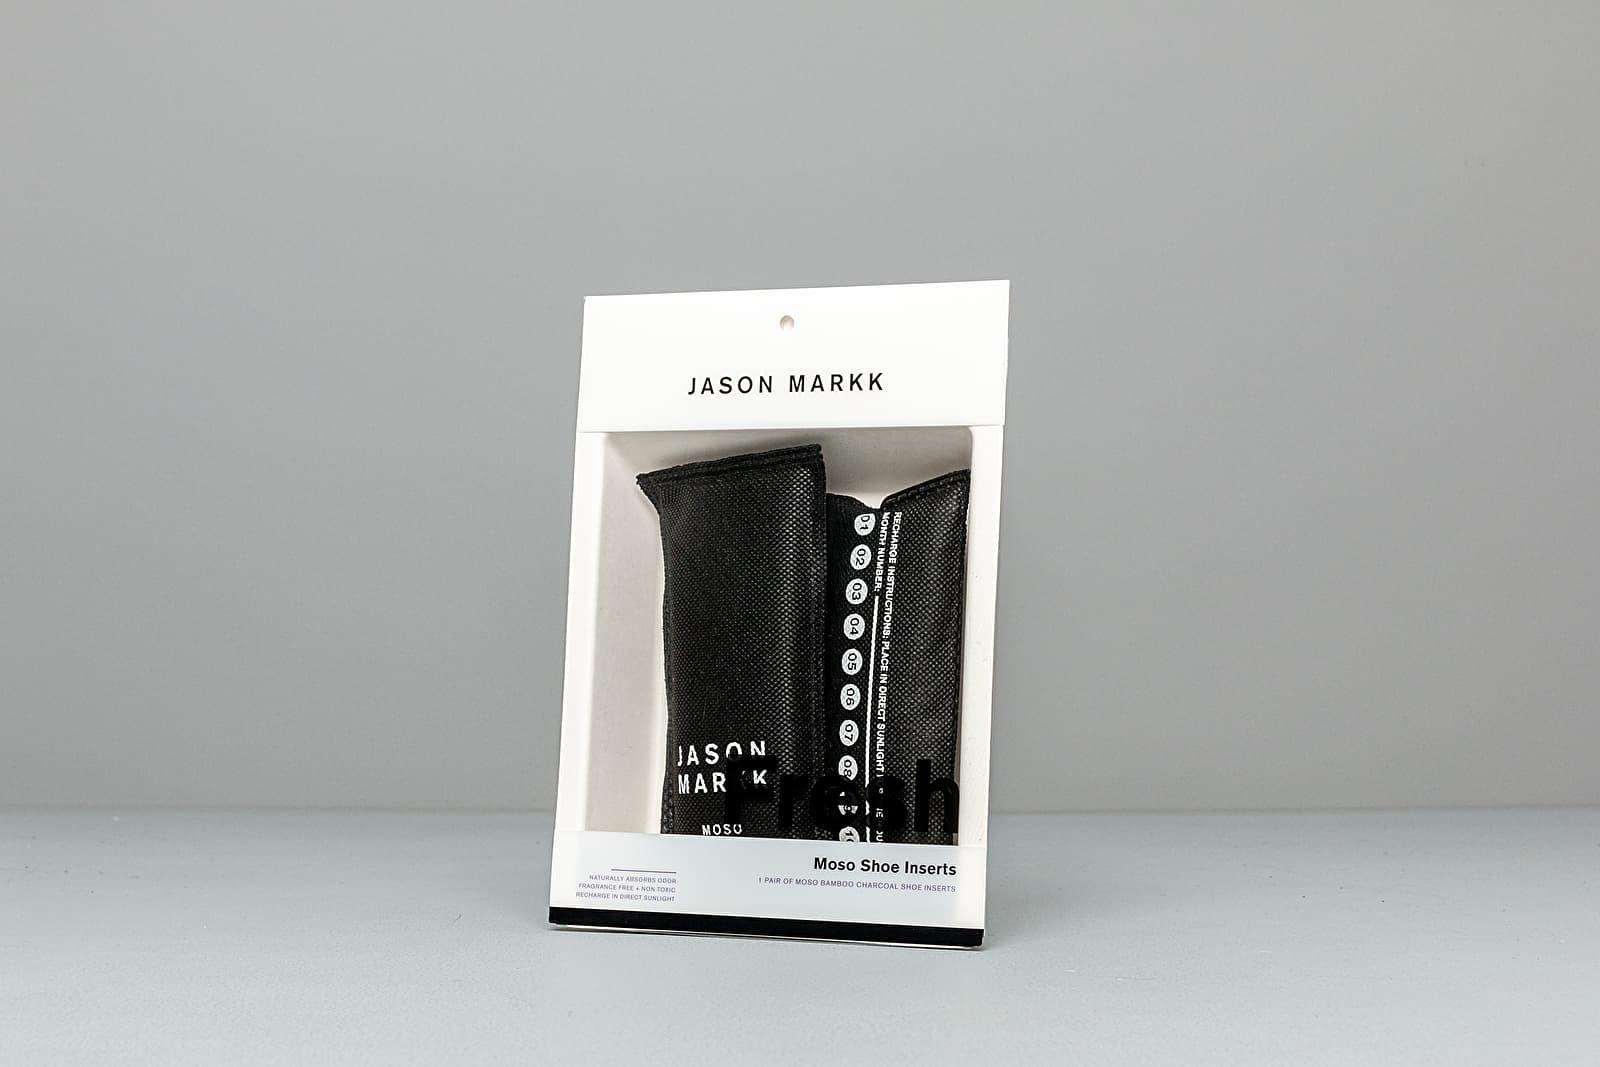 Jason Markk Moso Inserts